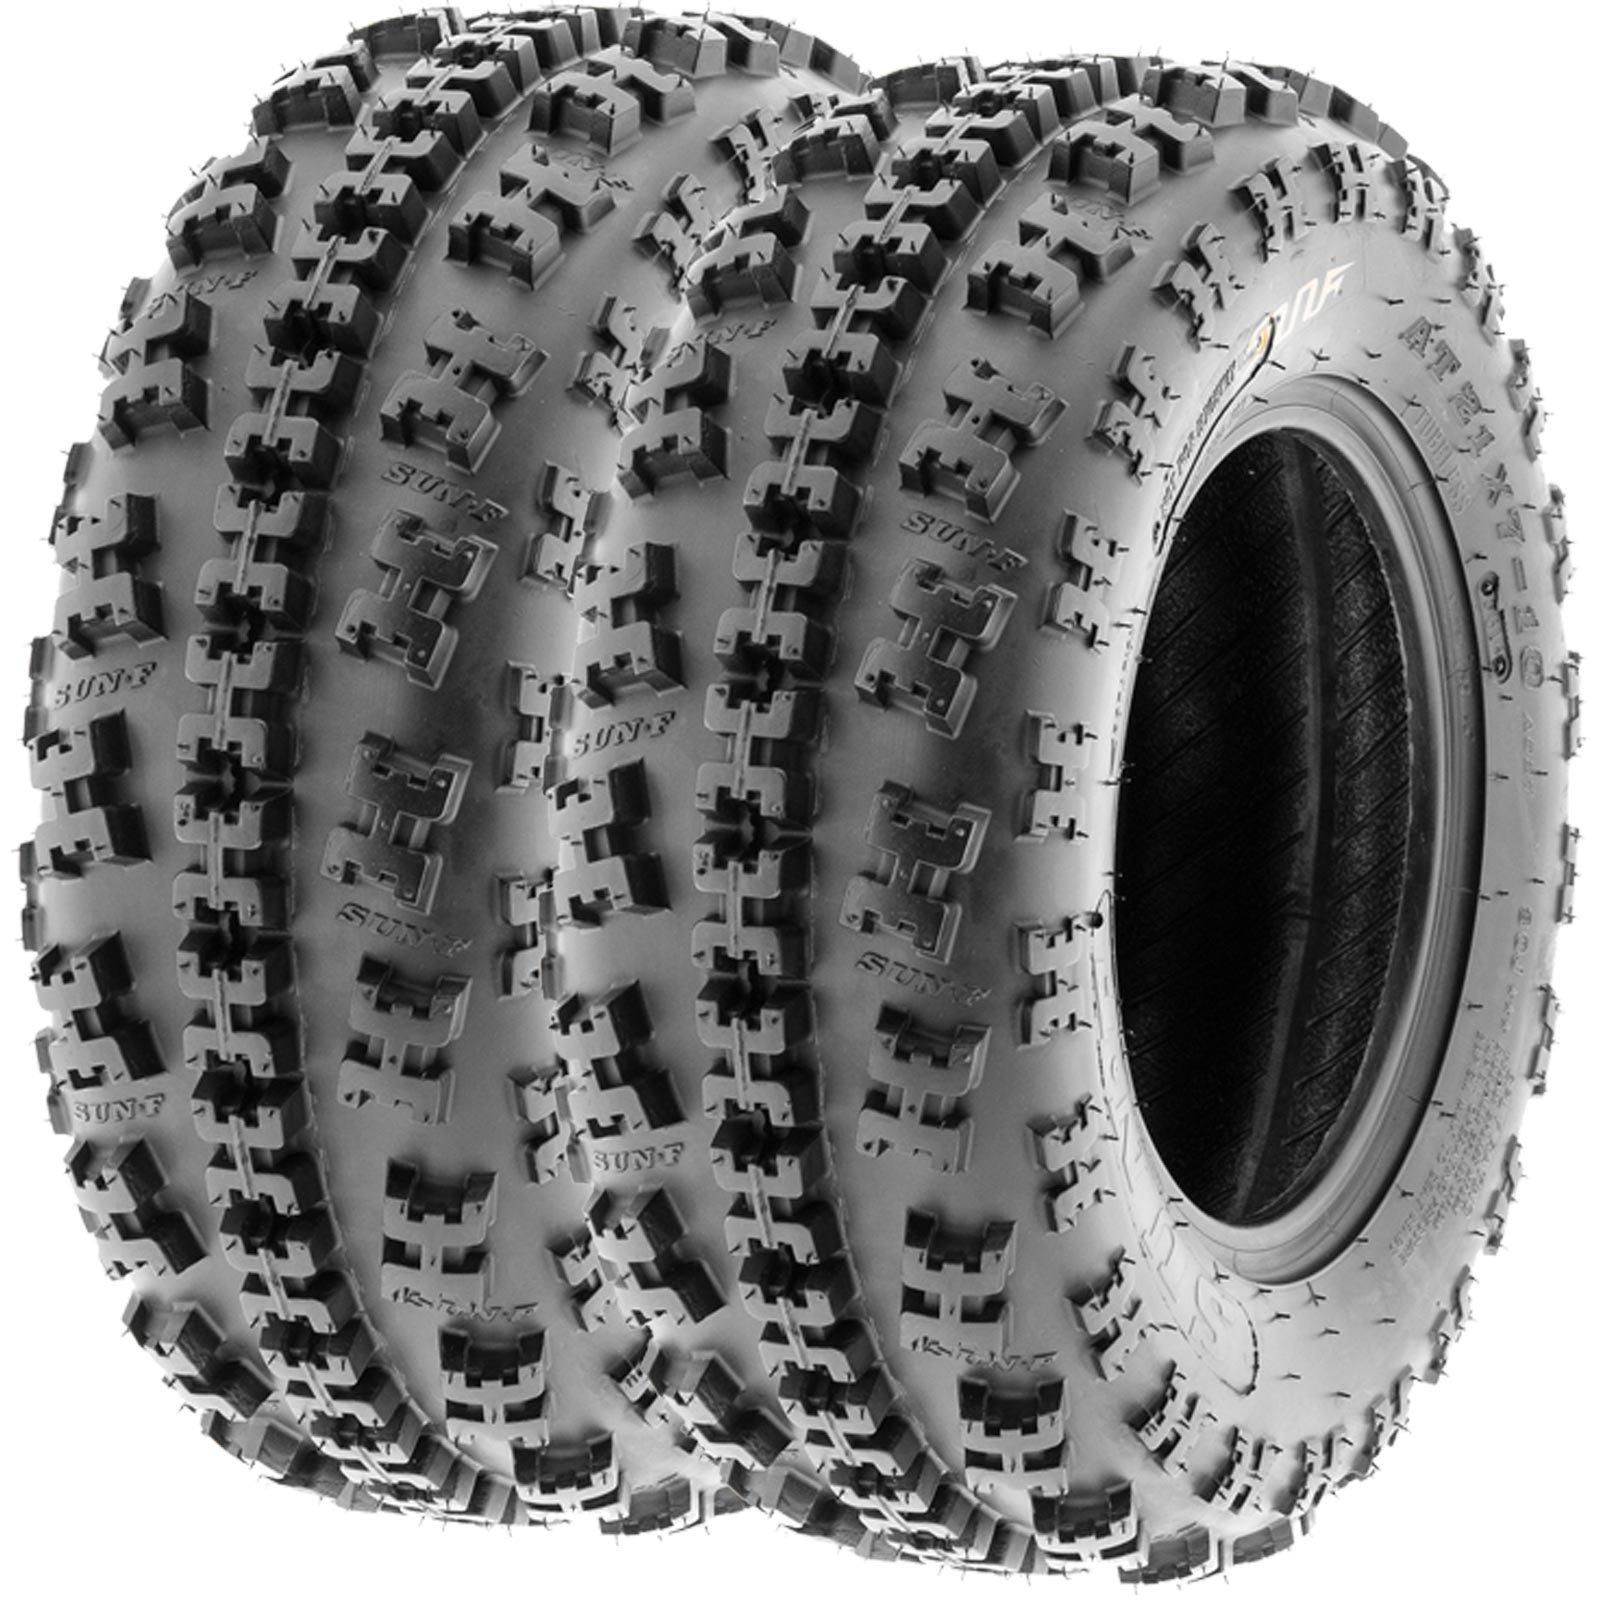 SunF 19x7-8 19x7x8 ATV UTV All Terrain Race Replacement 6 PR Tubeless Tires A027, [Set of 2]